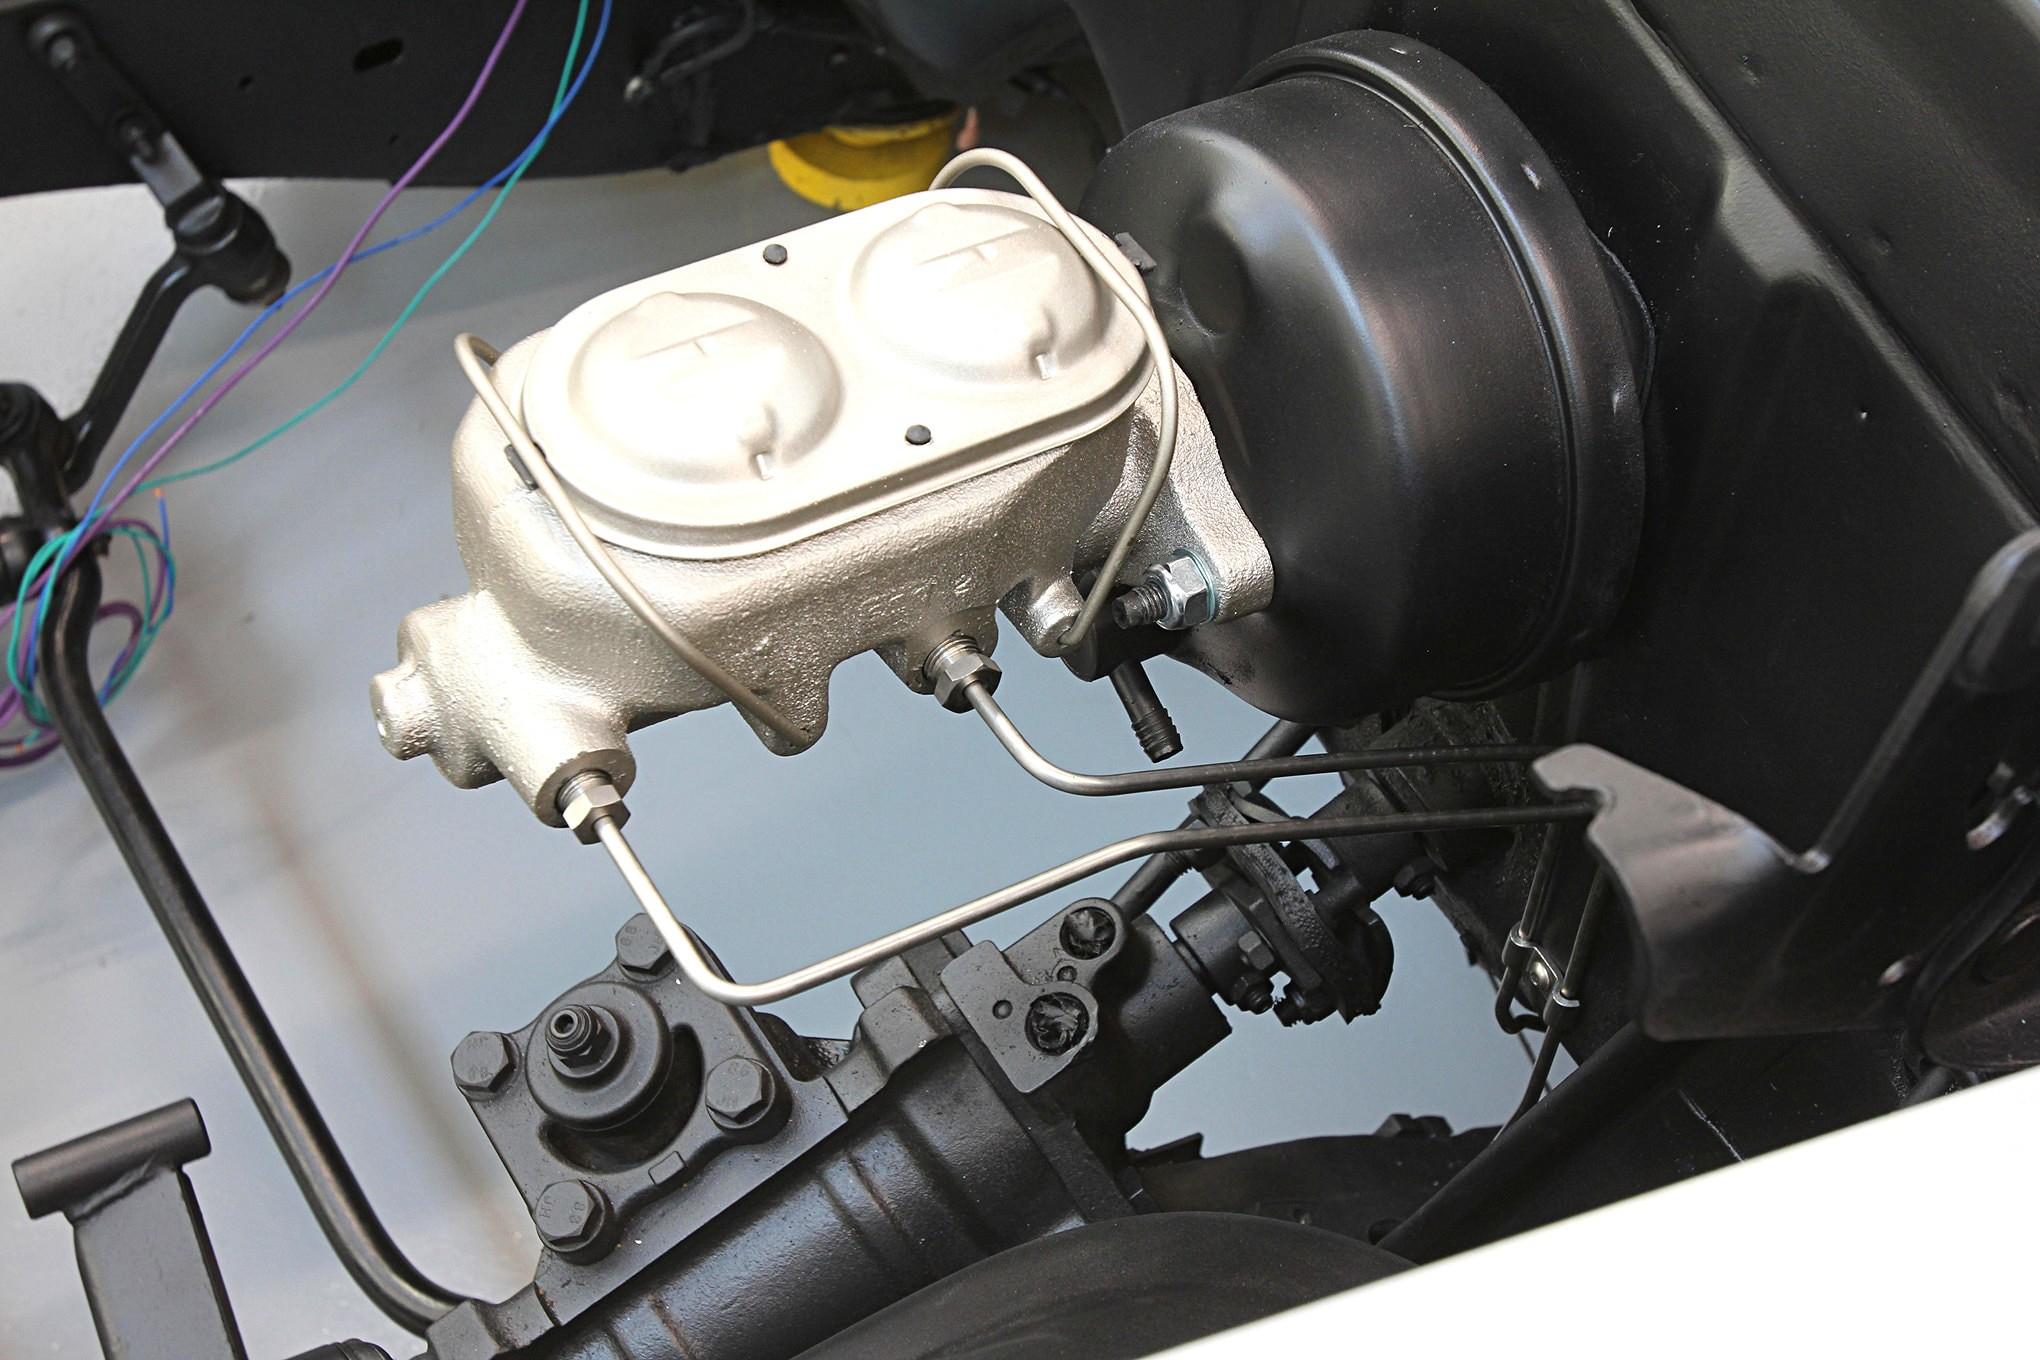 Automobile Brake System Diagram Proper Plumbing Pointers Making and Installing Brake Lines Hot Of Automobile Brake System Diagram